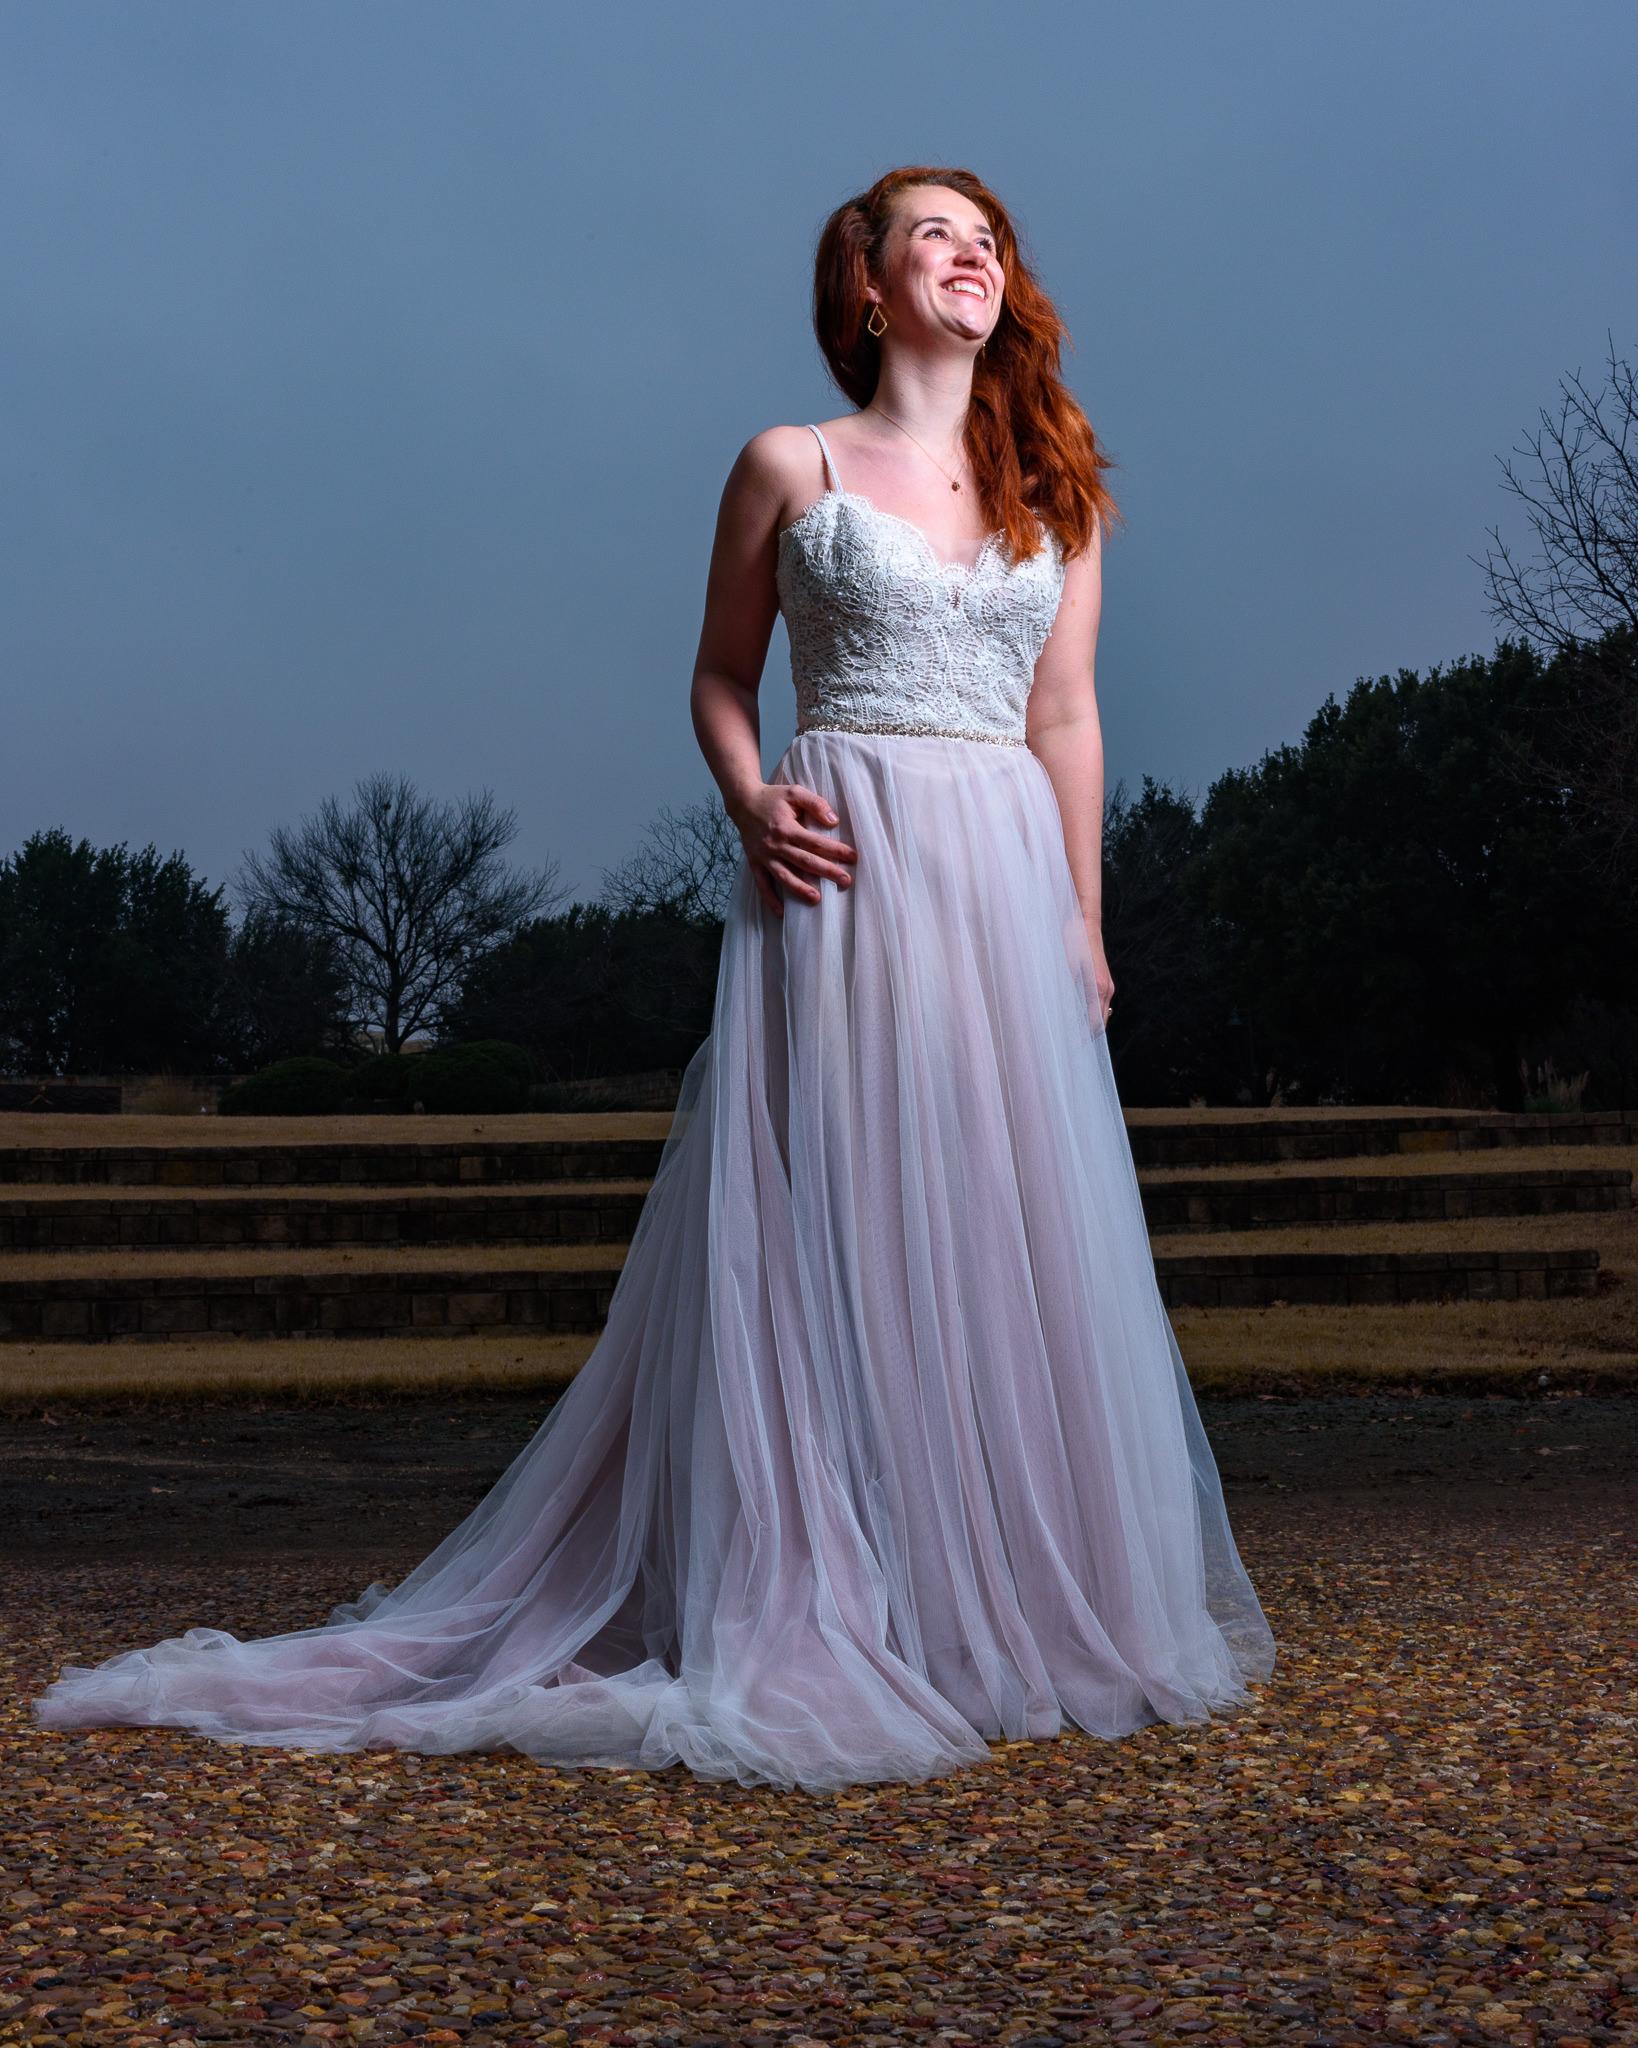 Dallas-Wedding-Photographer-Terry-McCranie-Photography-Cortnie-sky.jpg